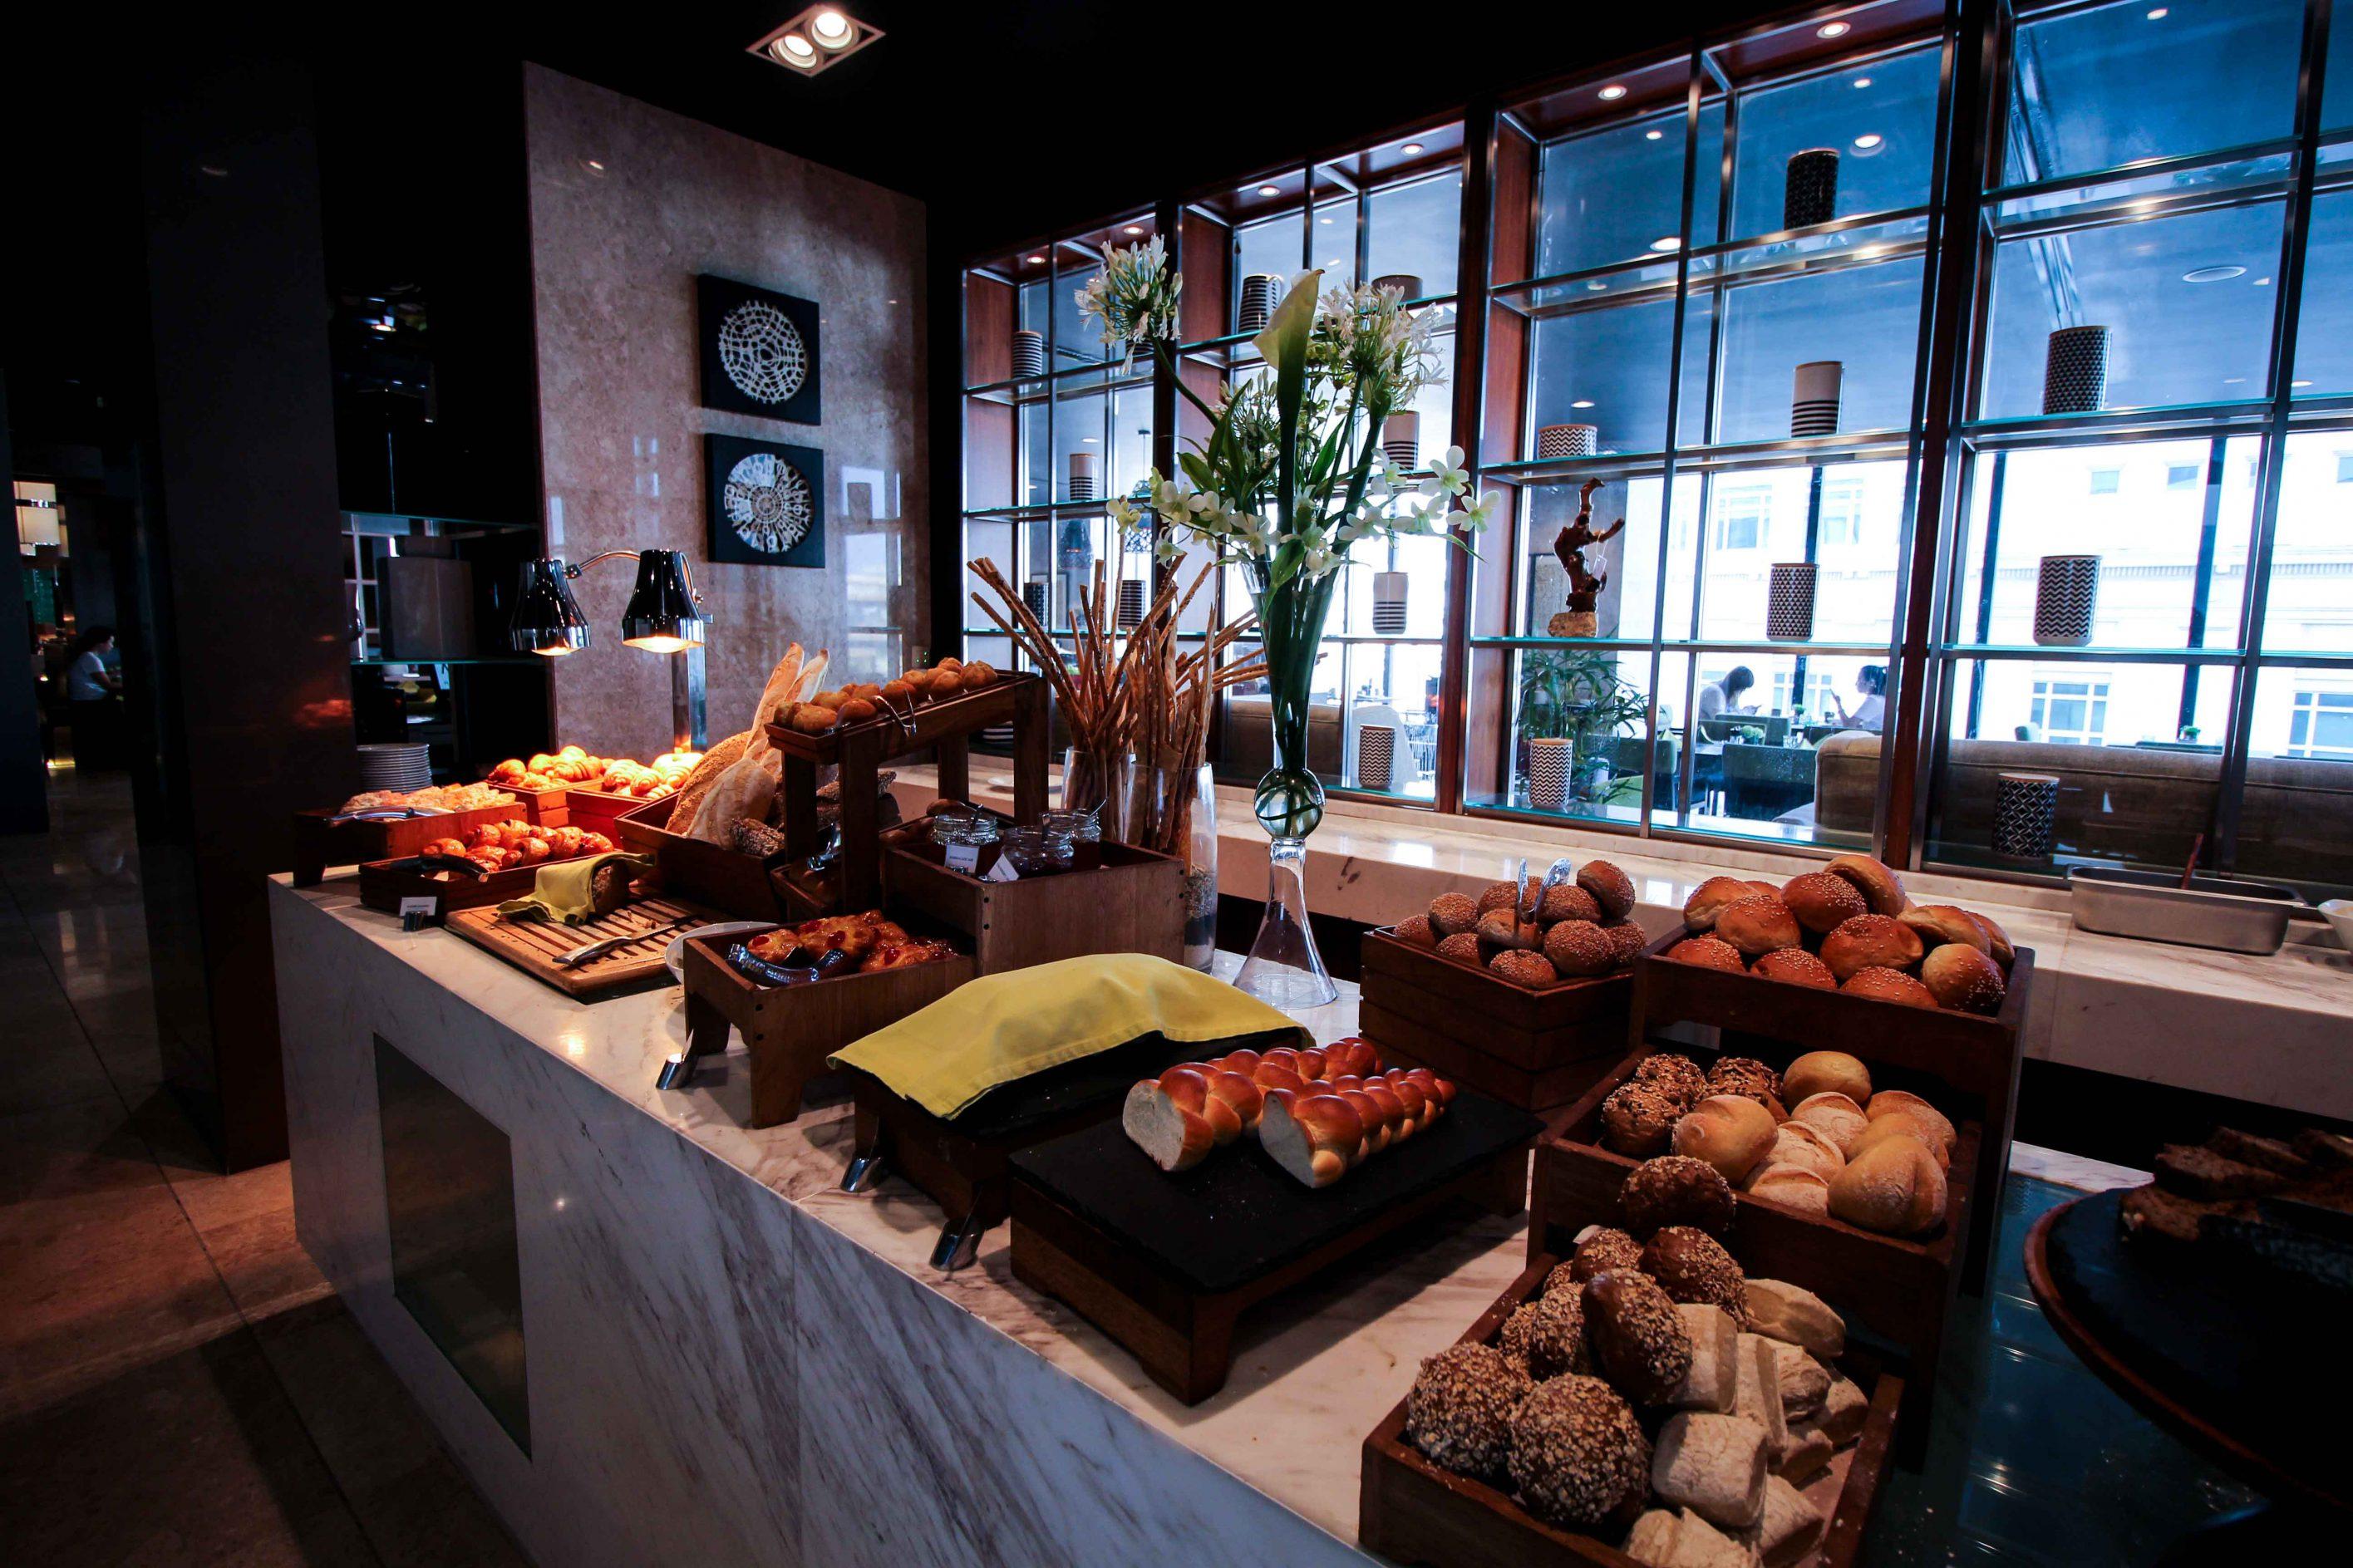 Mövenpick Colombo Hotel Frühstück Auswahl Brot Teigwaren Reiseblog Brinisfashionbook Hotel Sri Lanka